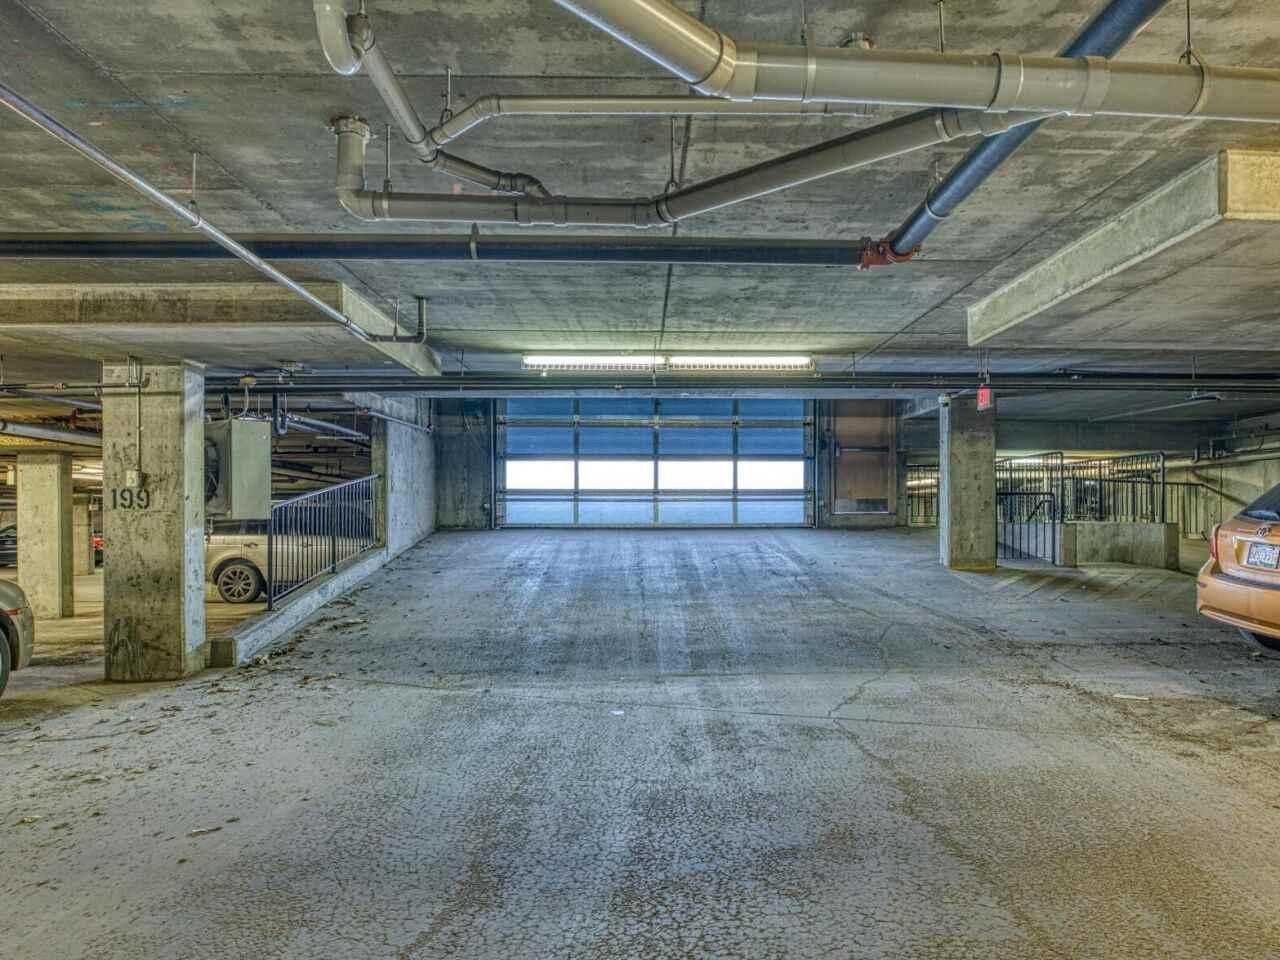 429 16807 100 Avenue - Glenwood_EDMO Lowrise Apartment for sale, 2 Bedrooms (E4234341) #24